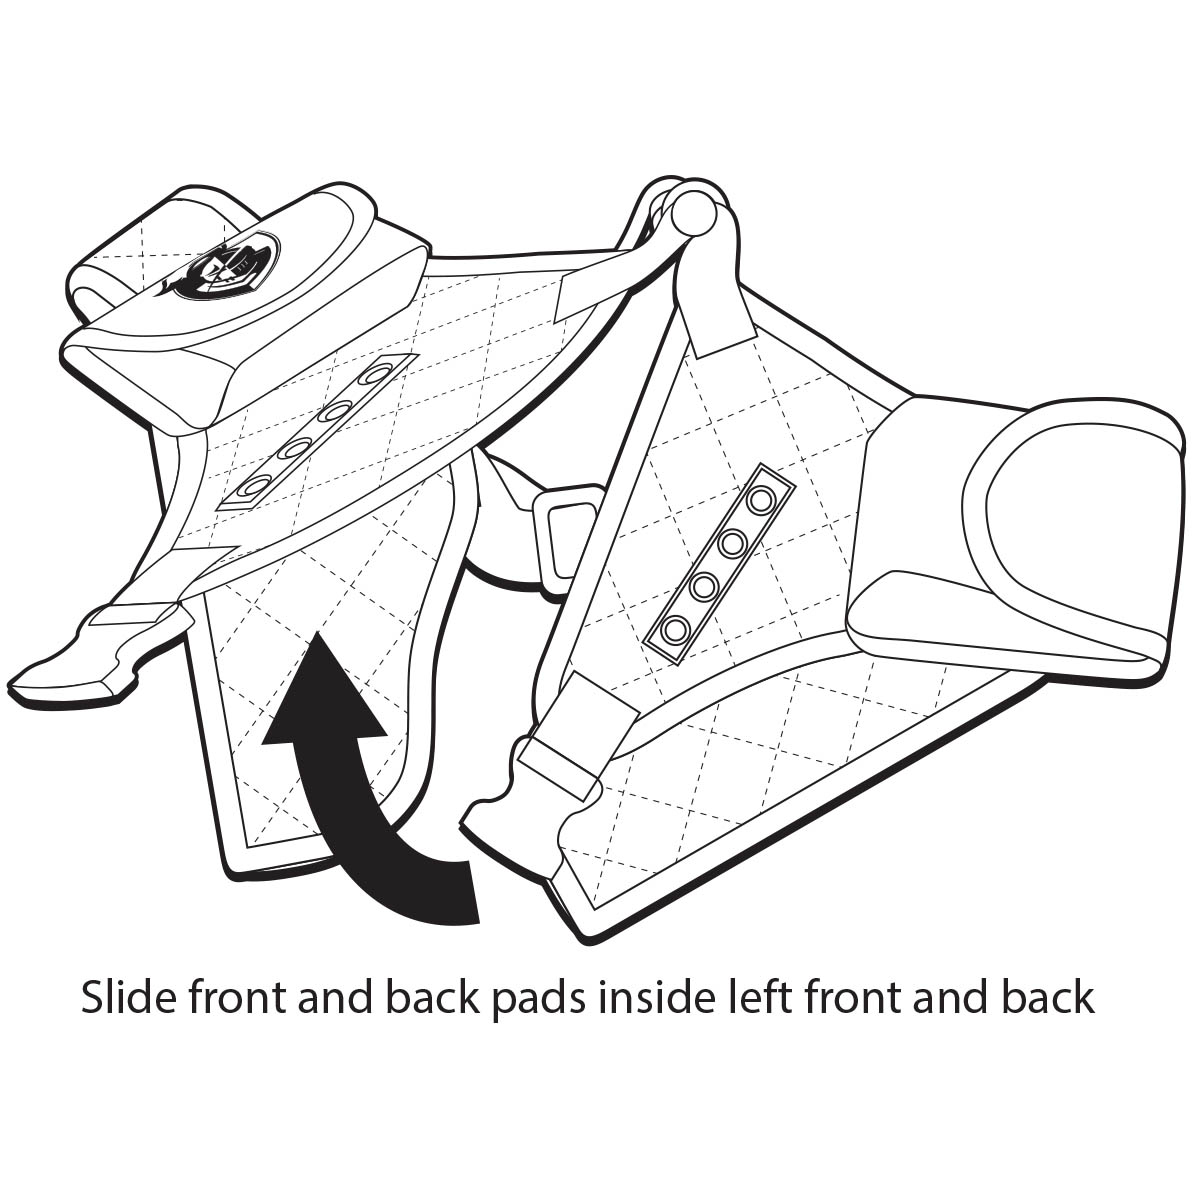 Led Armor Schematic Illustrations